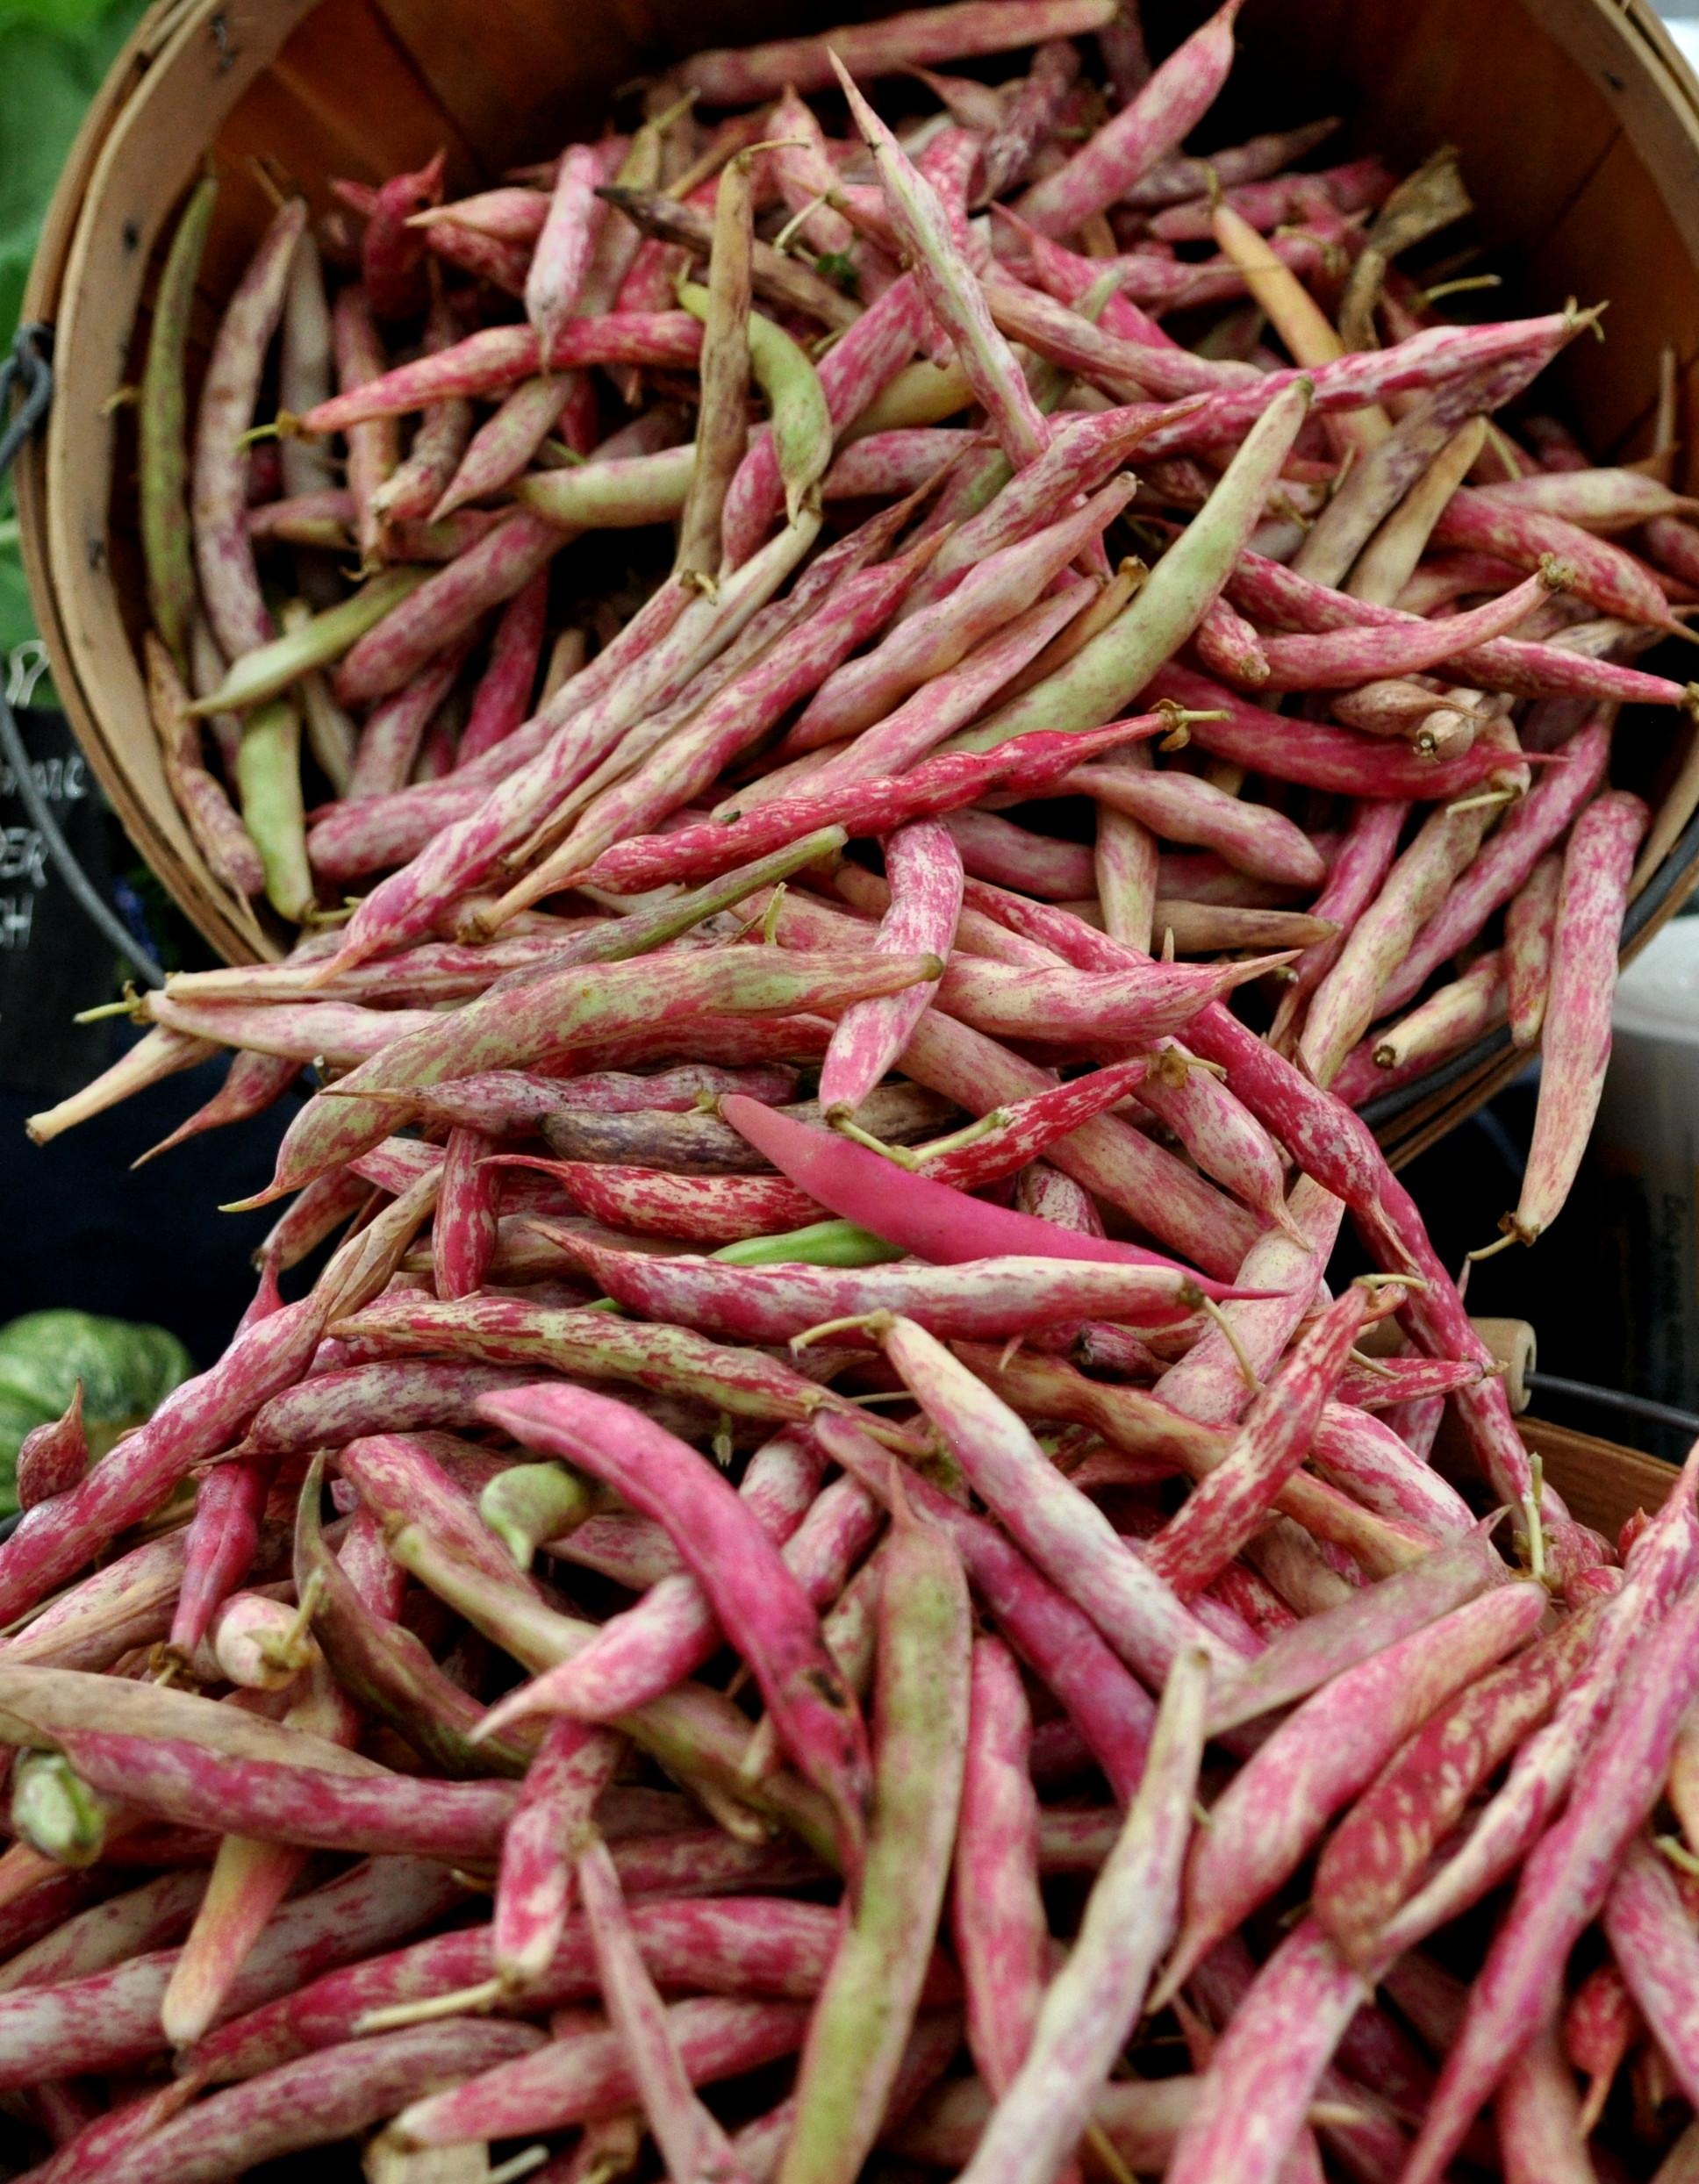 Cranberry beans from Kirsop Farm at Wallingford Farmers Market. Copyright Zachary D. Lyons.